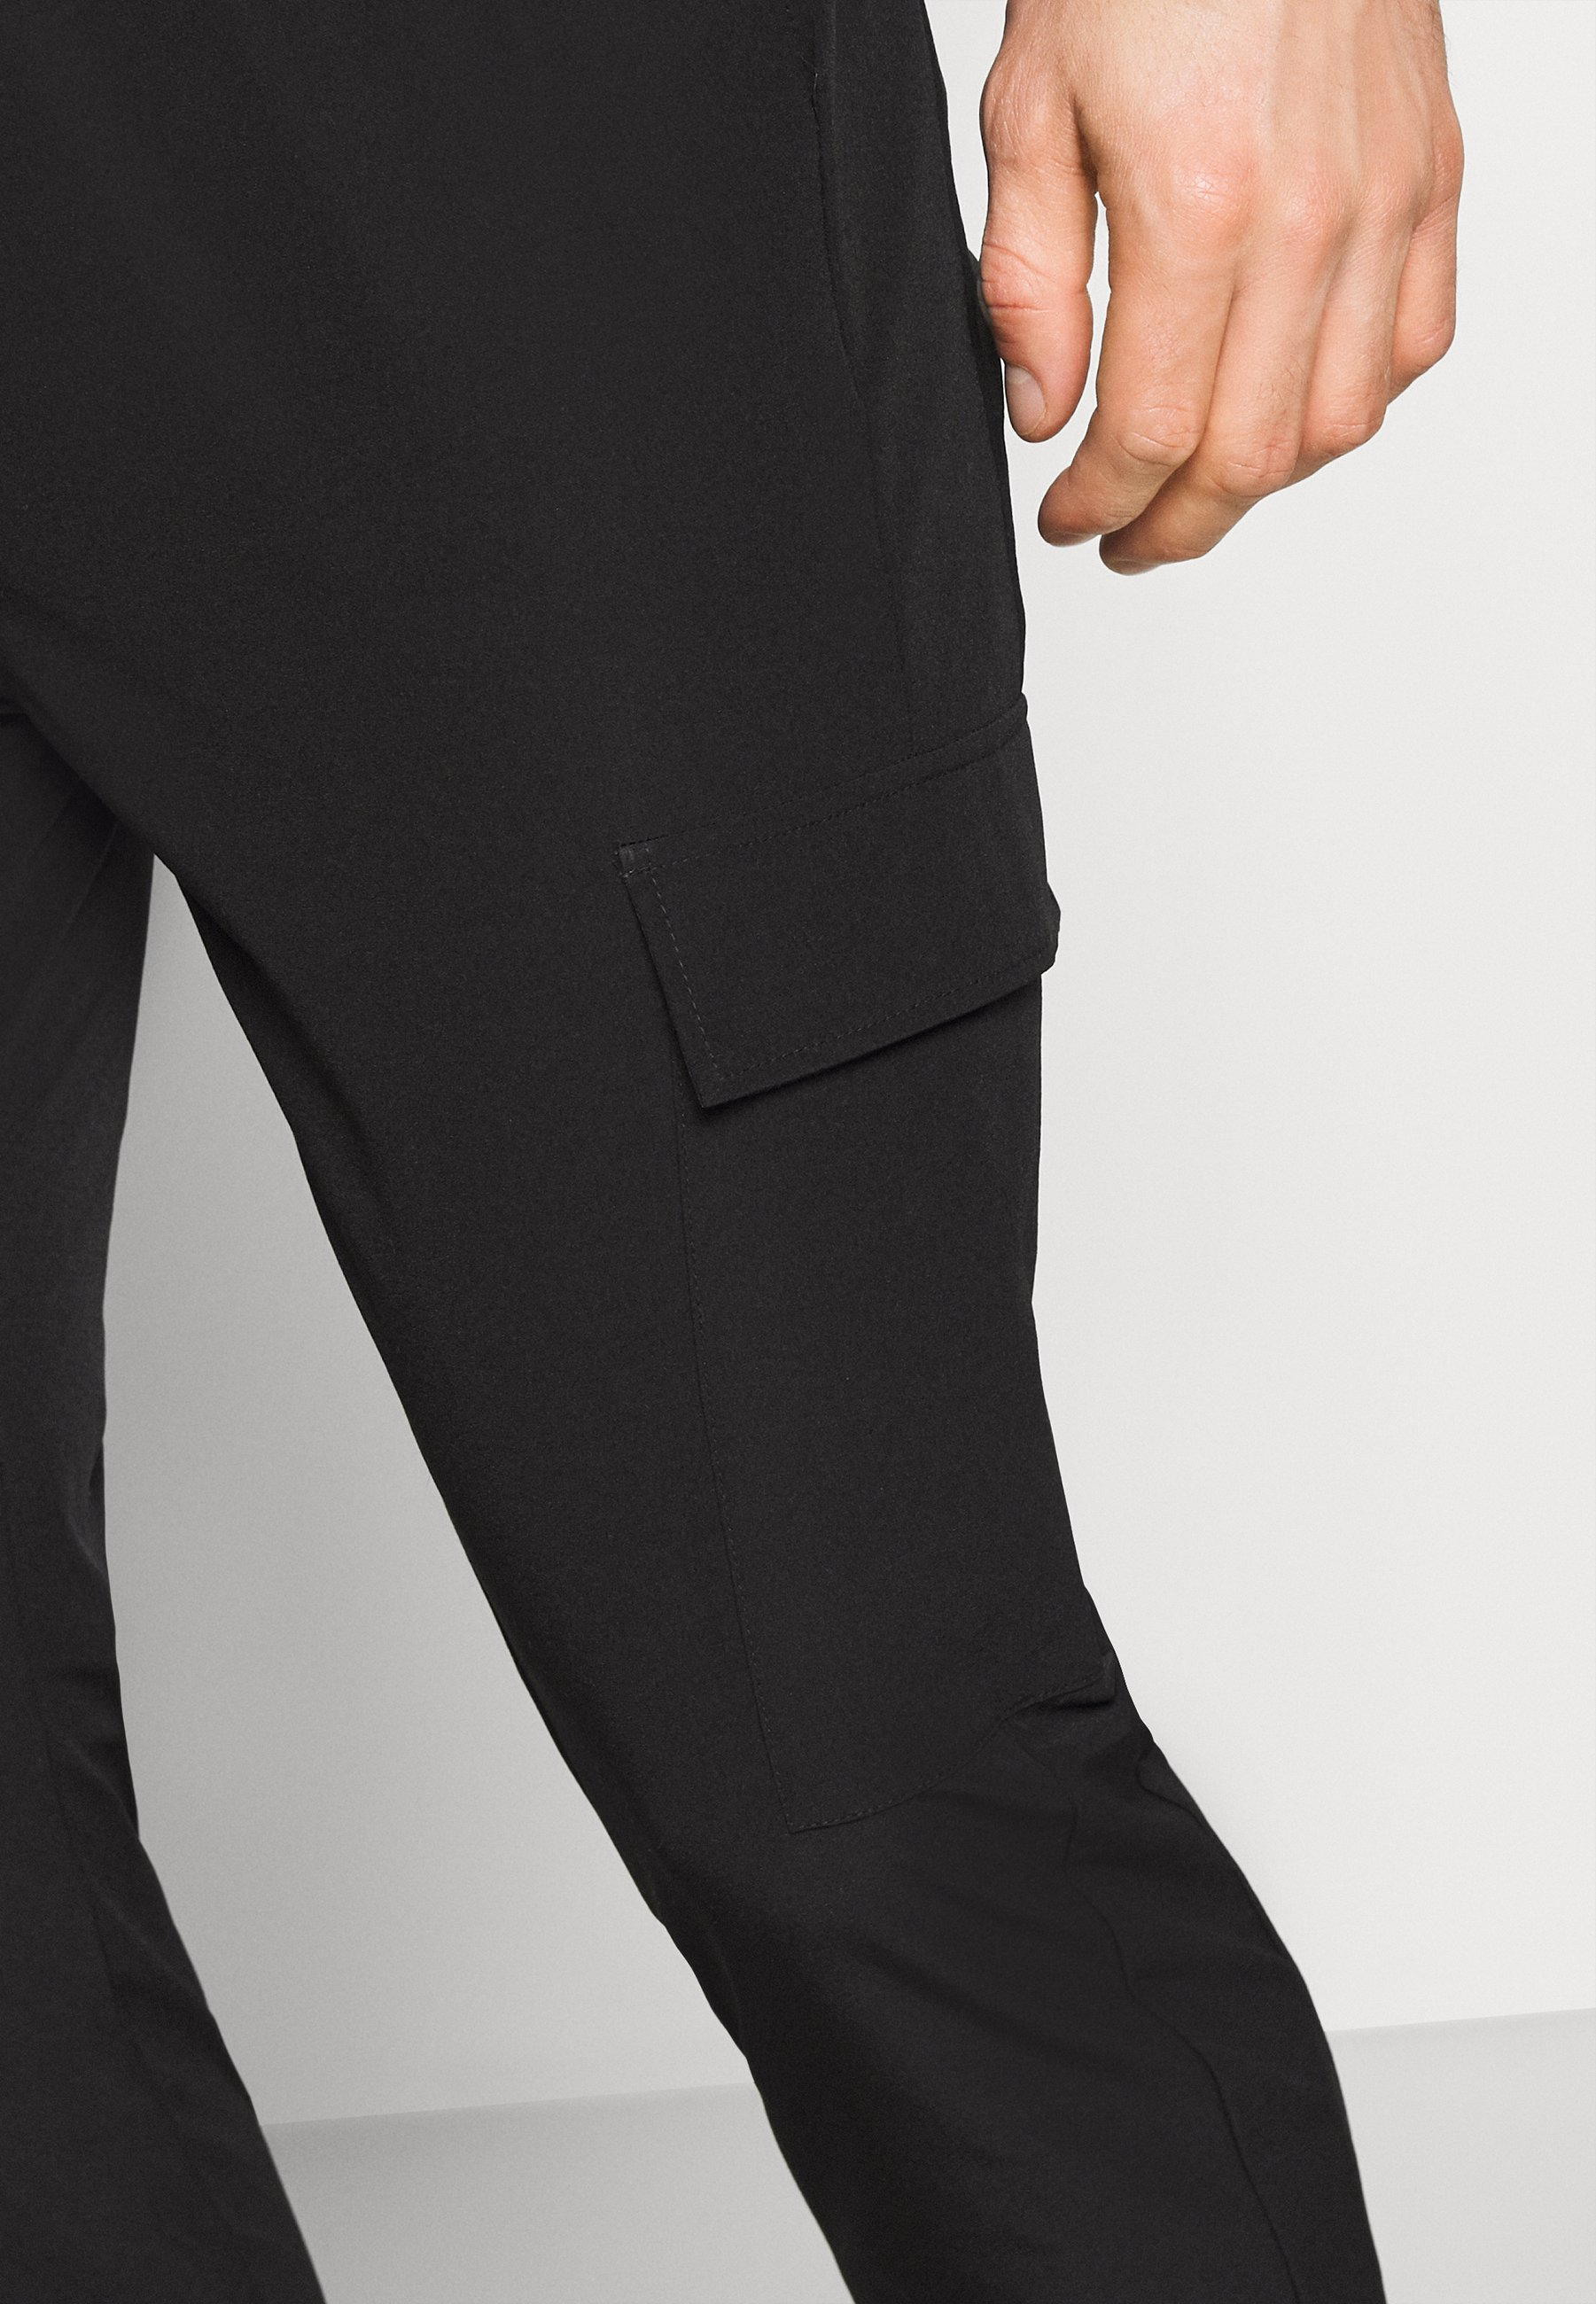 Just Junkies OLIVER PANTS - Pantalon cargo - black